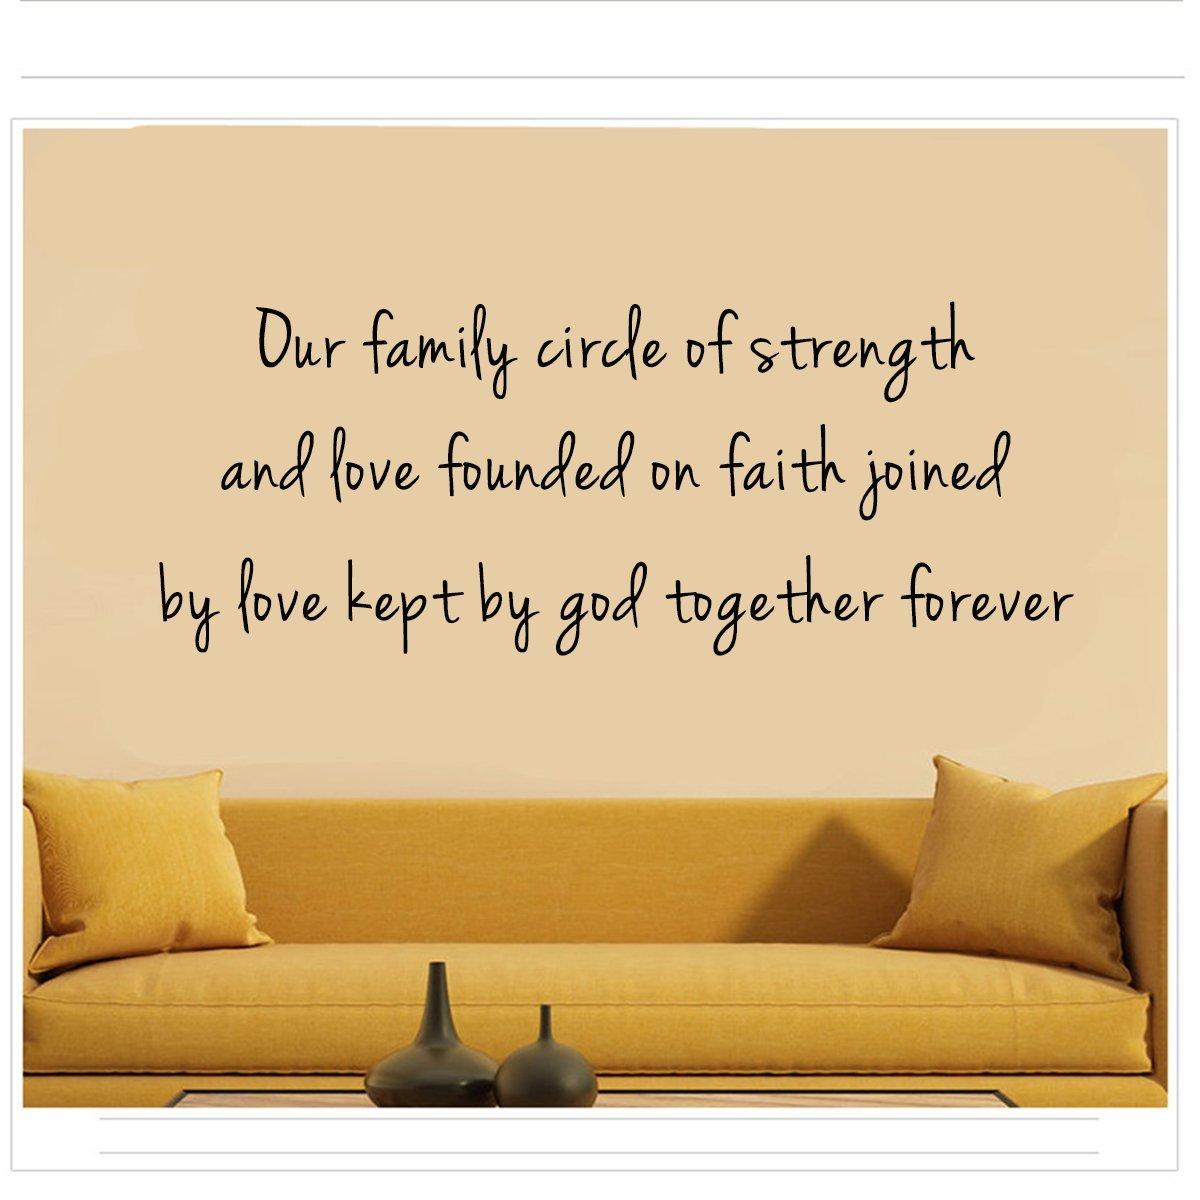 Amazon.com: Our family circle of strengthand love founded on faith ...